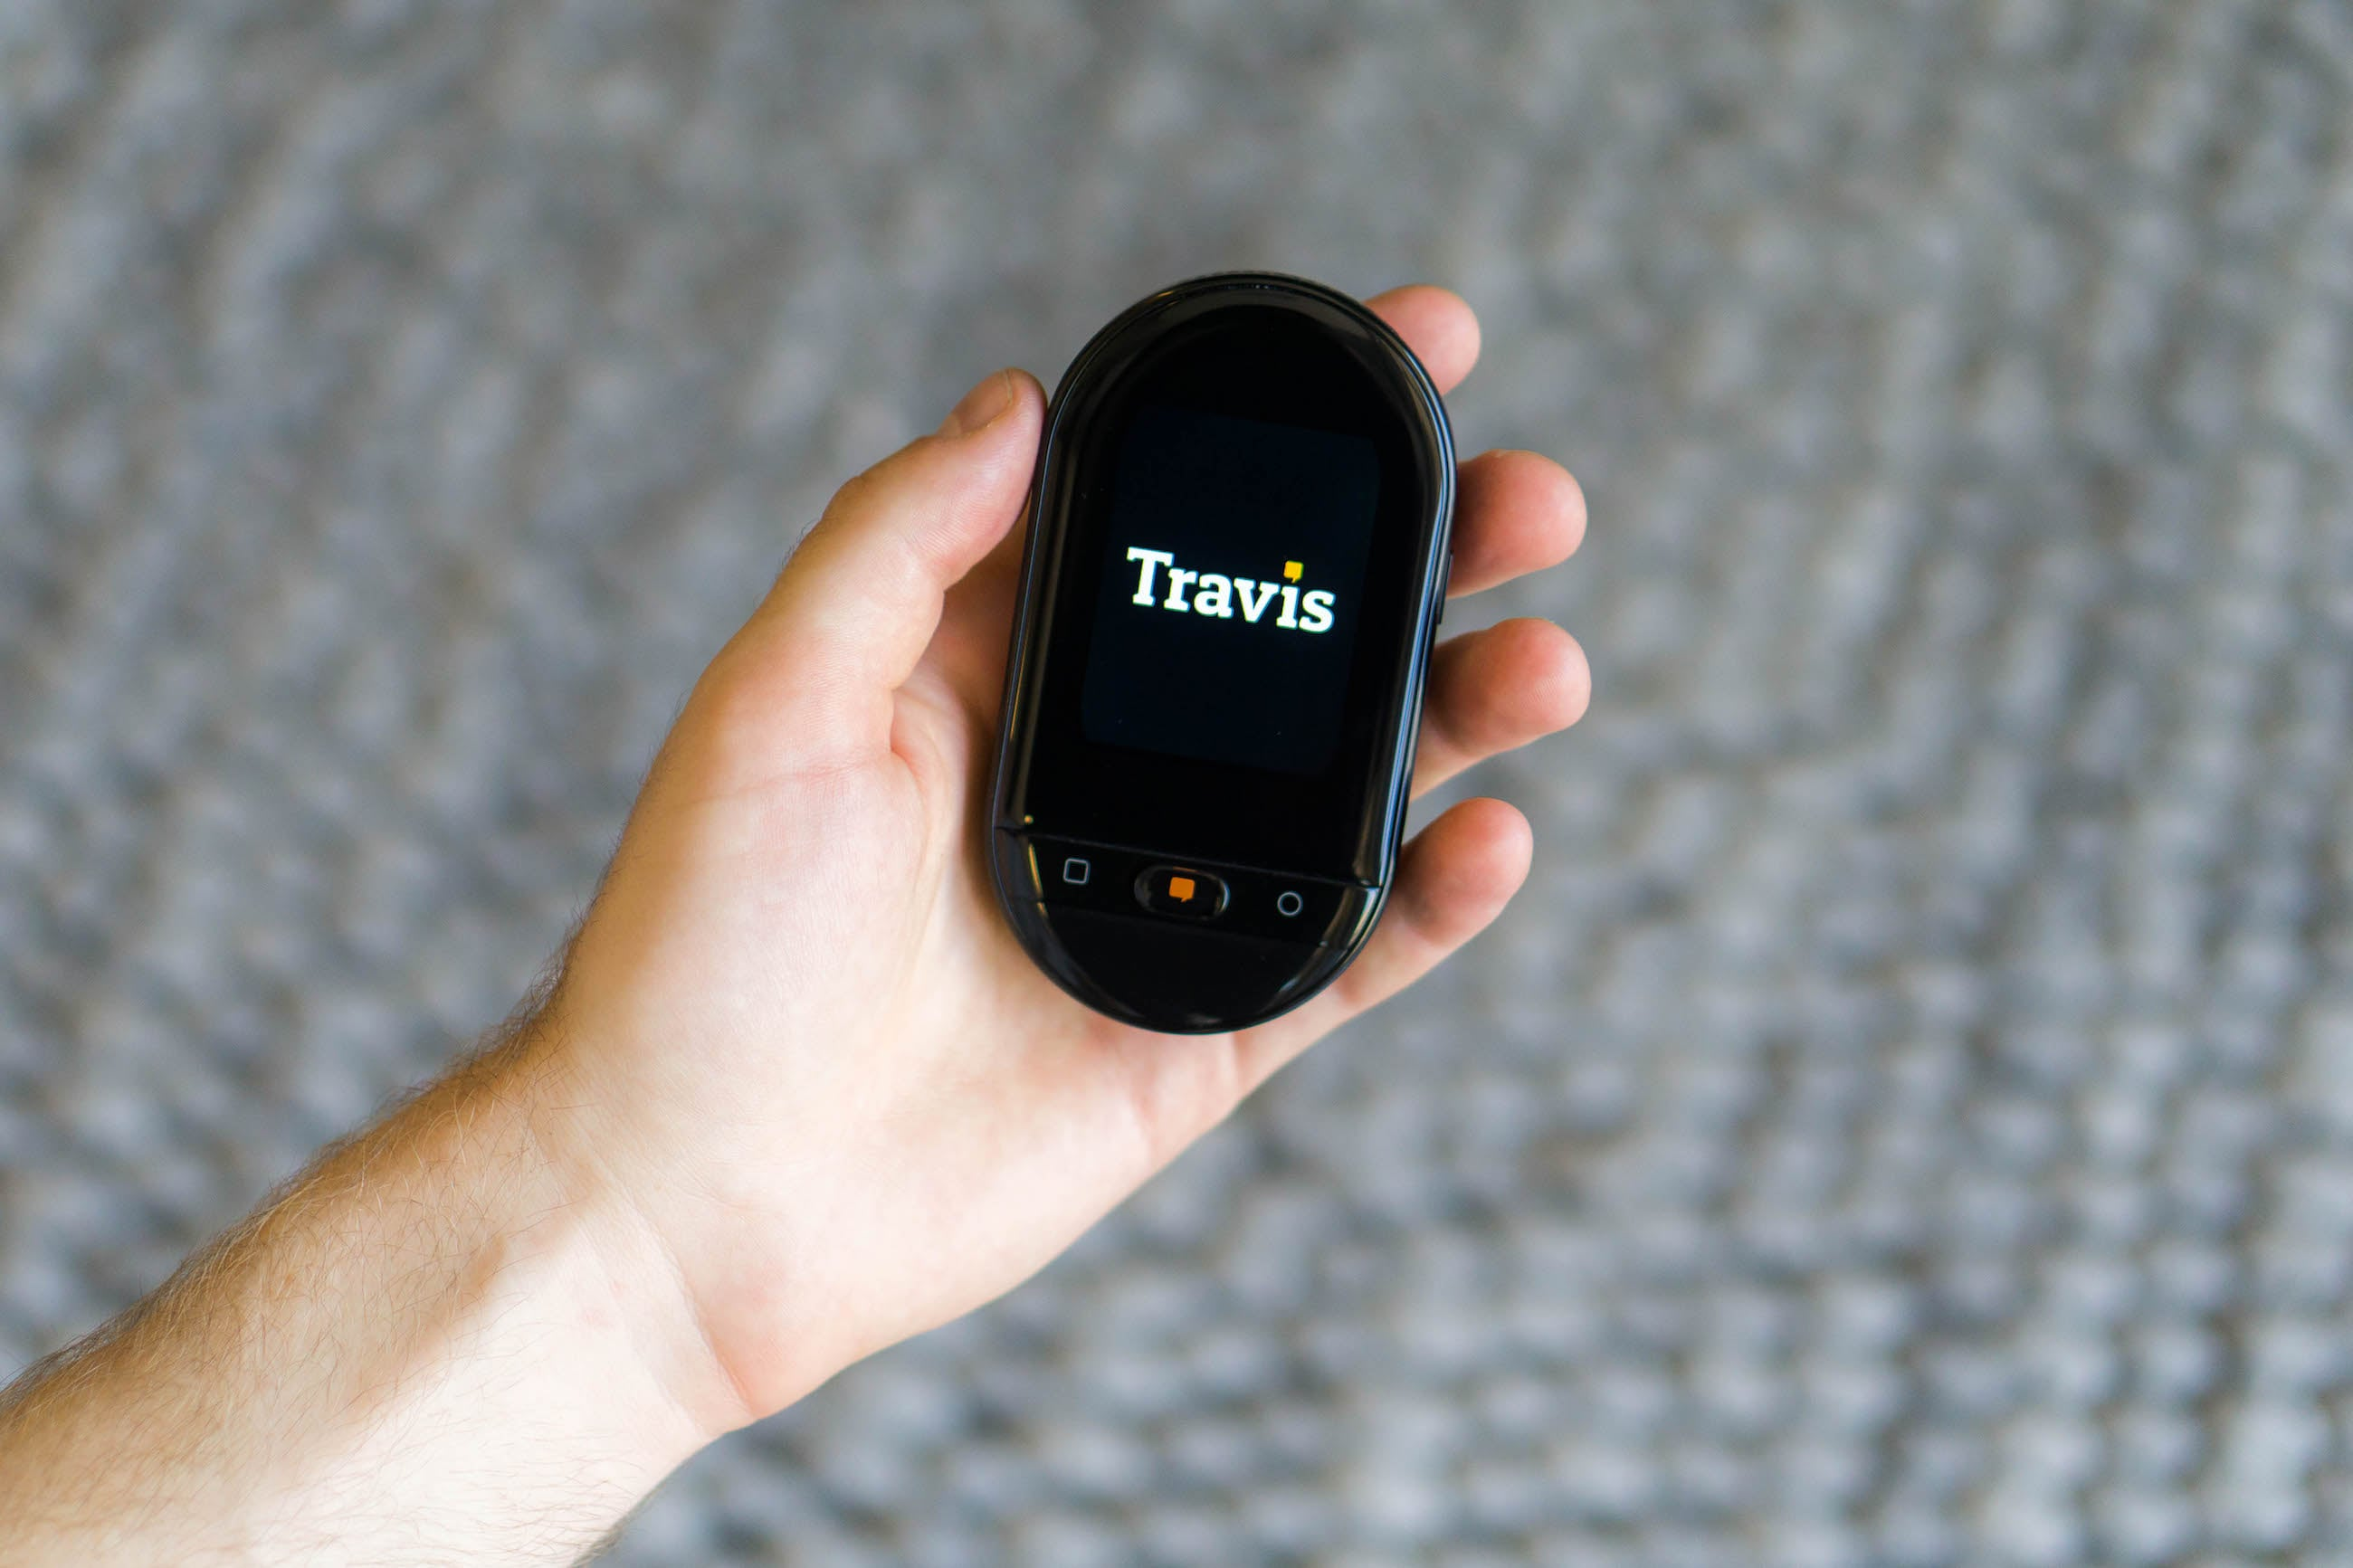 Travis Touch Pocket Translator